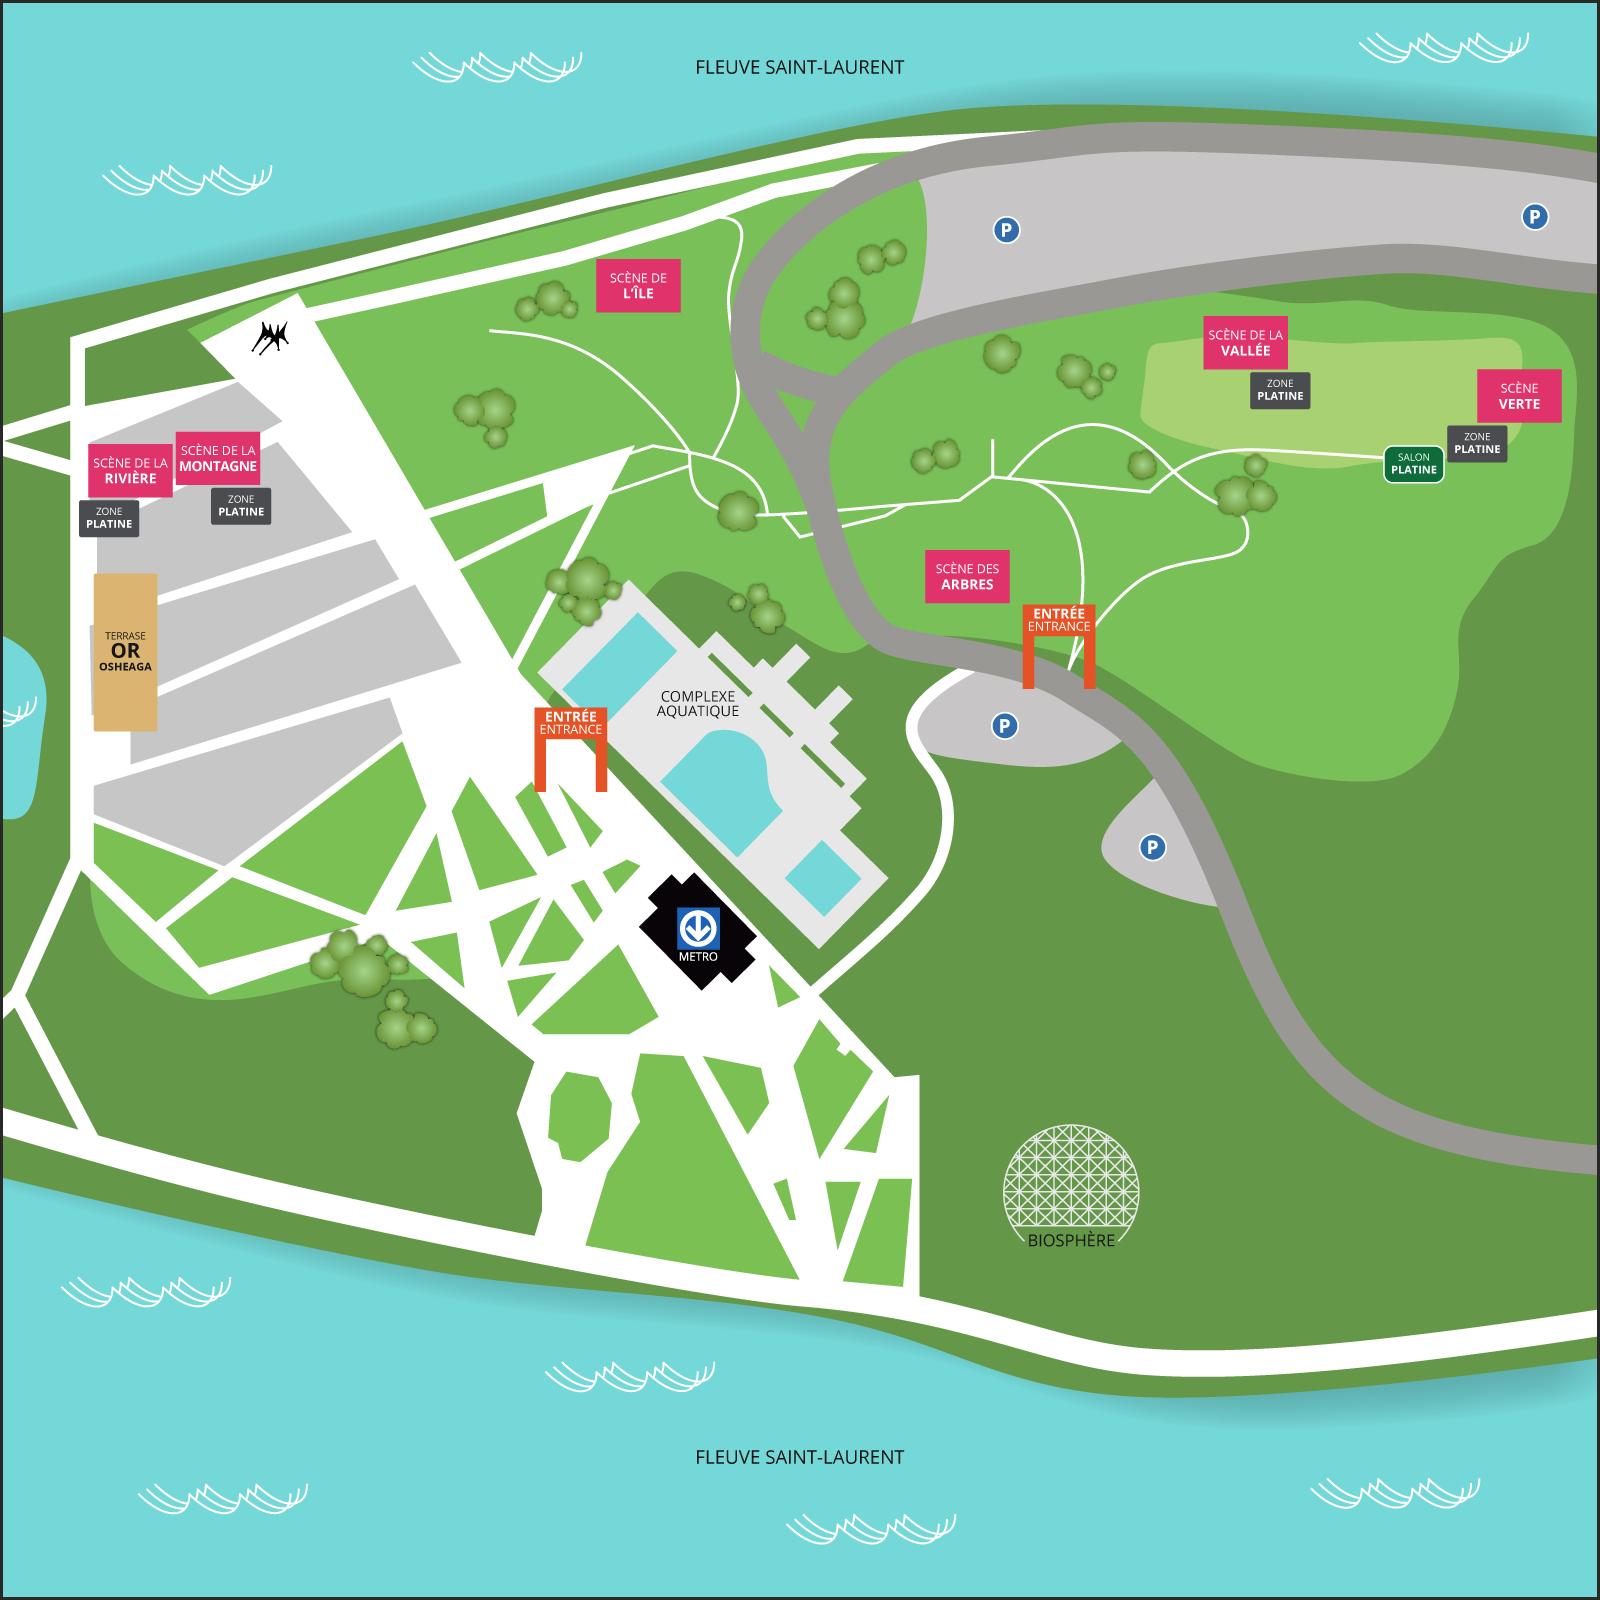 ÎleSoniq 2020 - Postponed